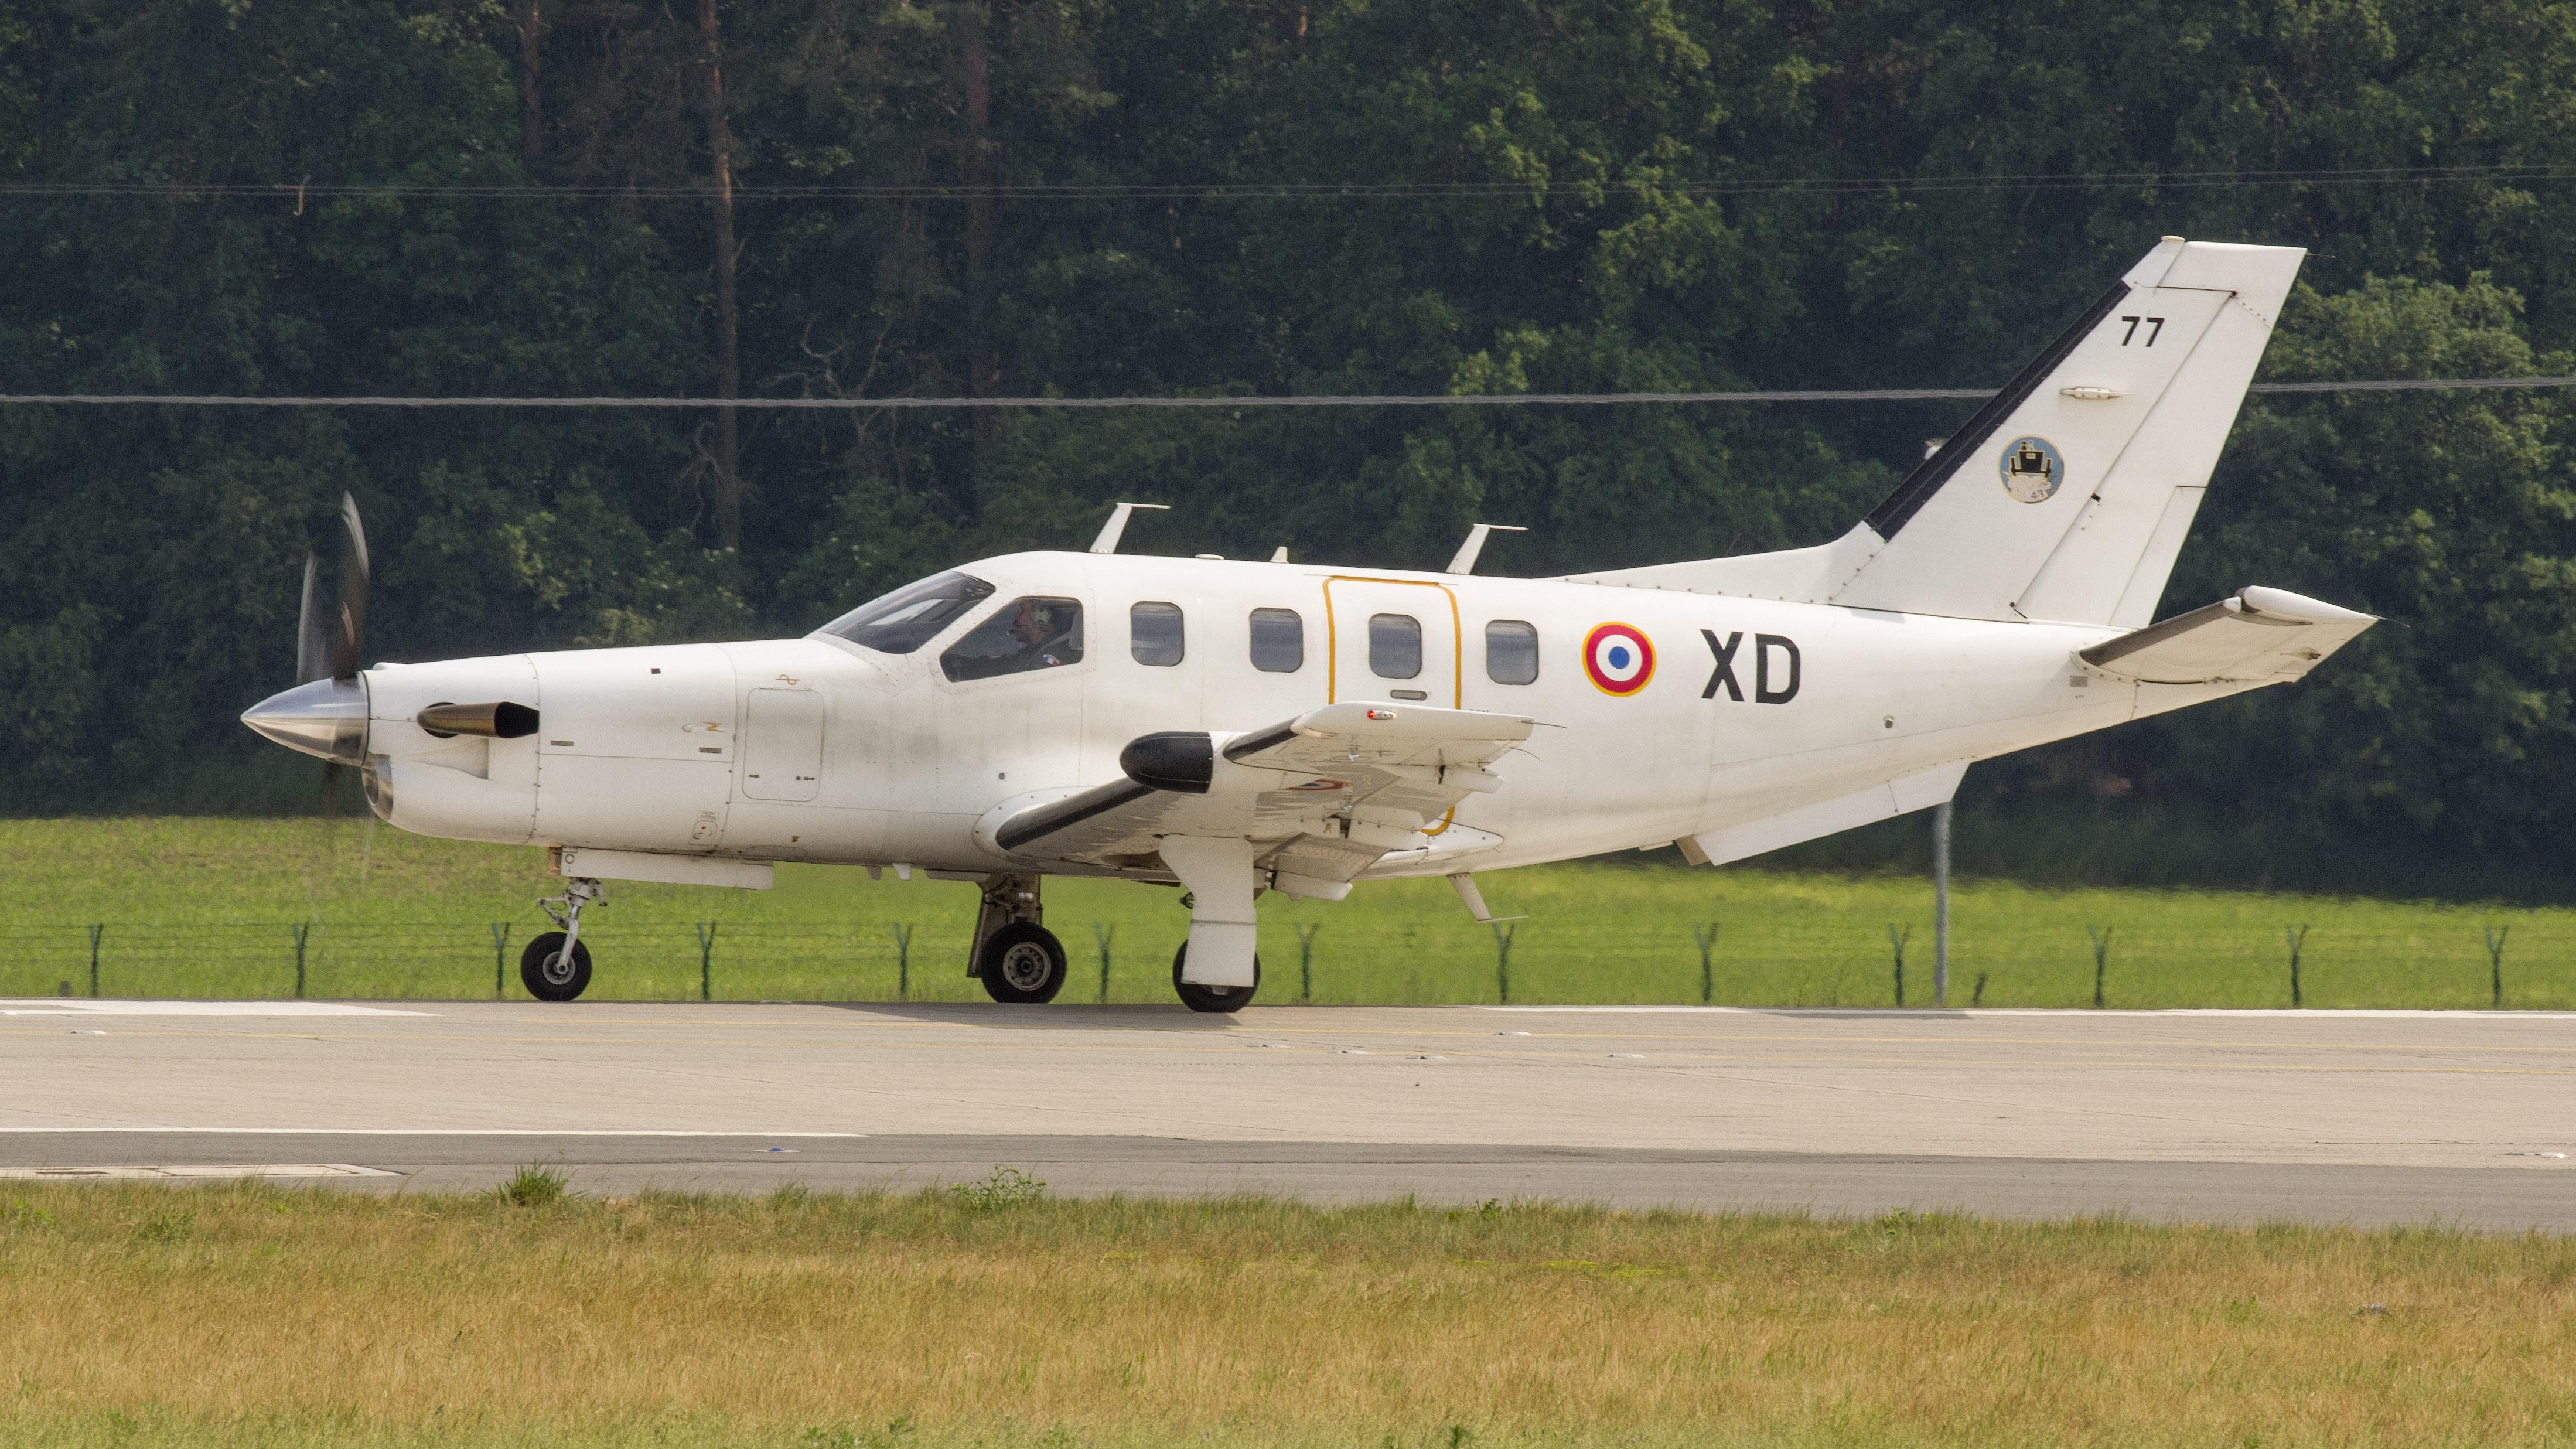 _IMG2863 Socata TBM-700 XD 77 France air force